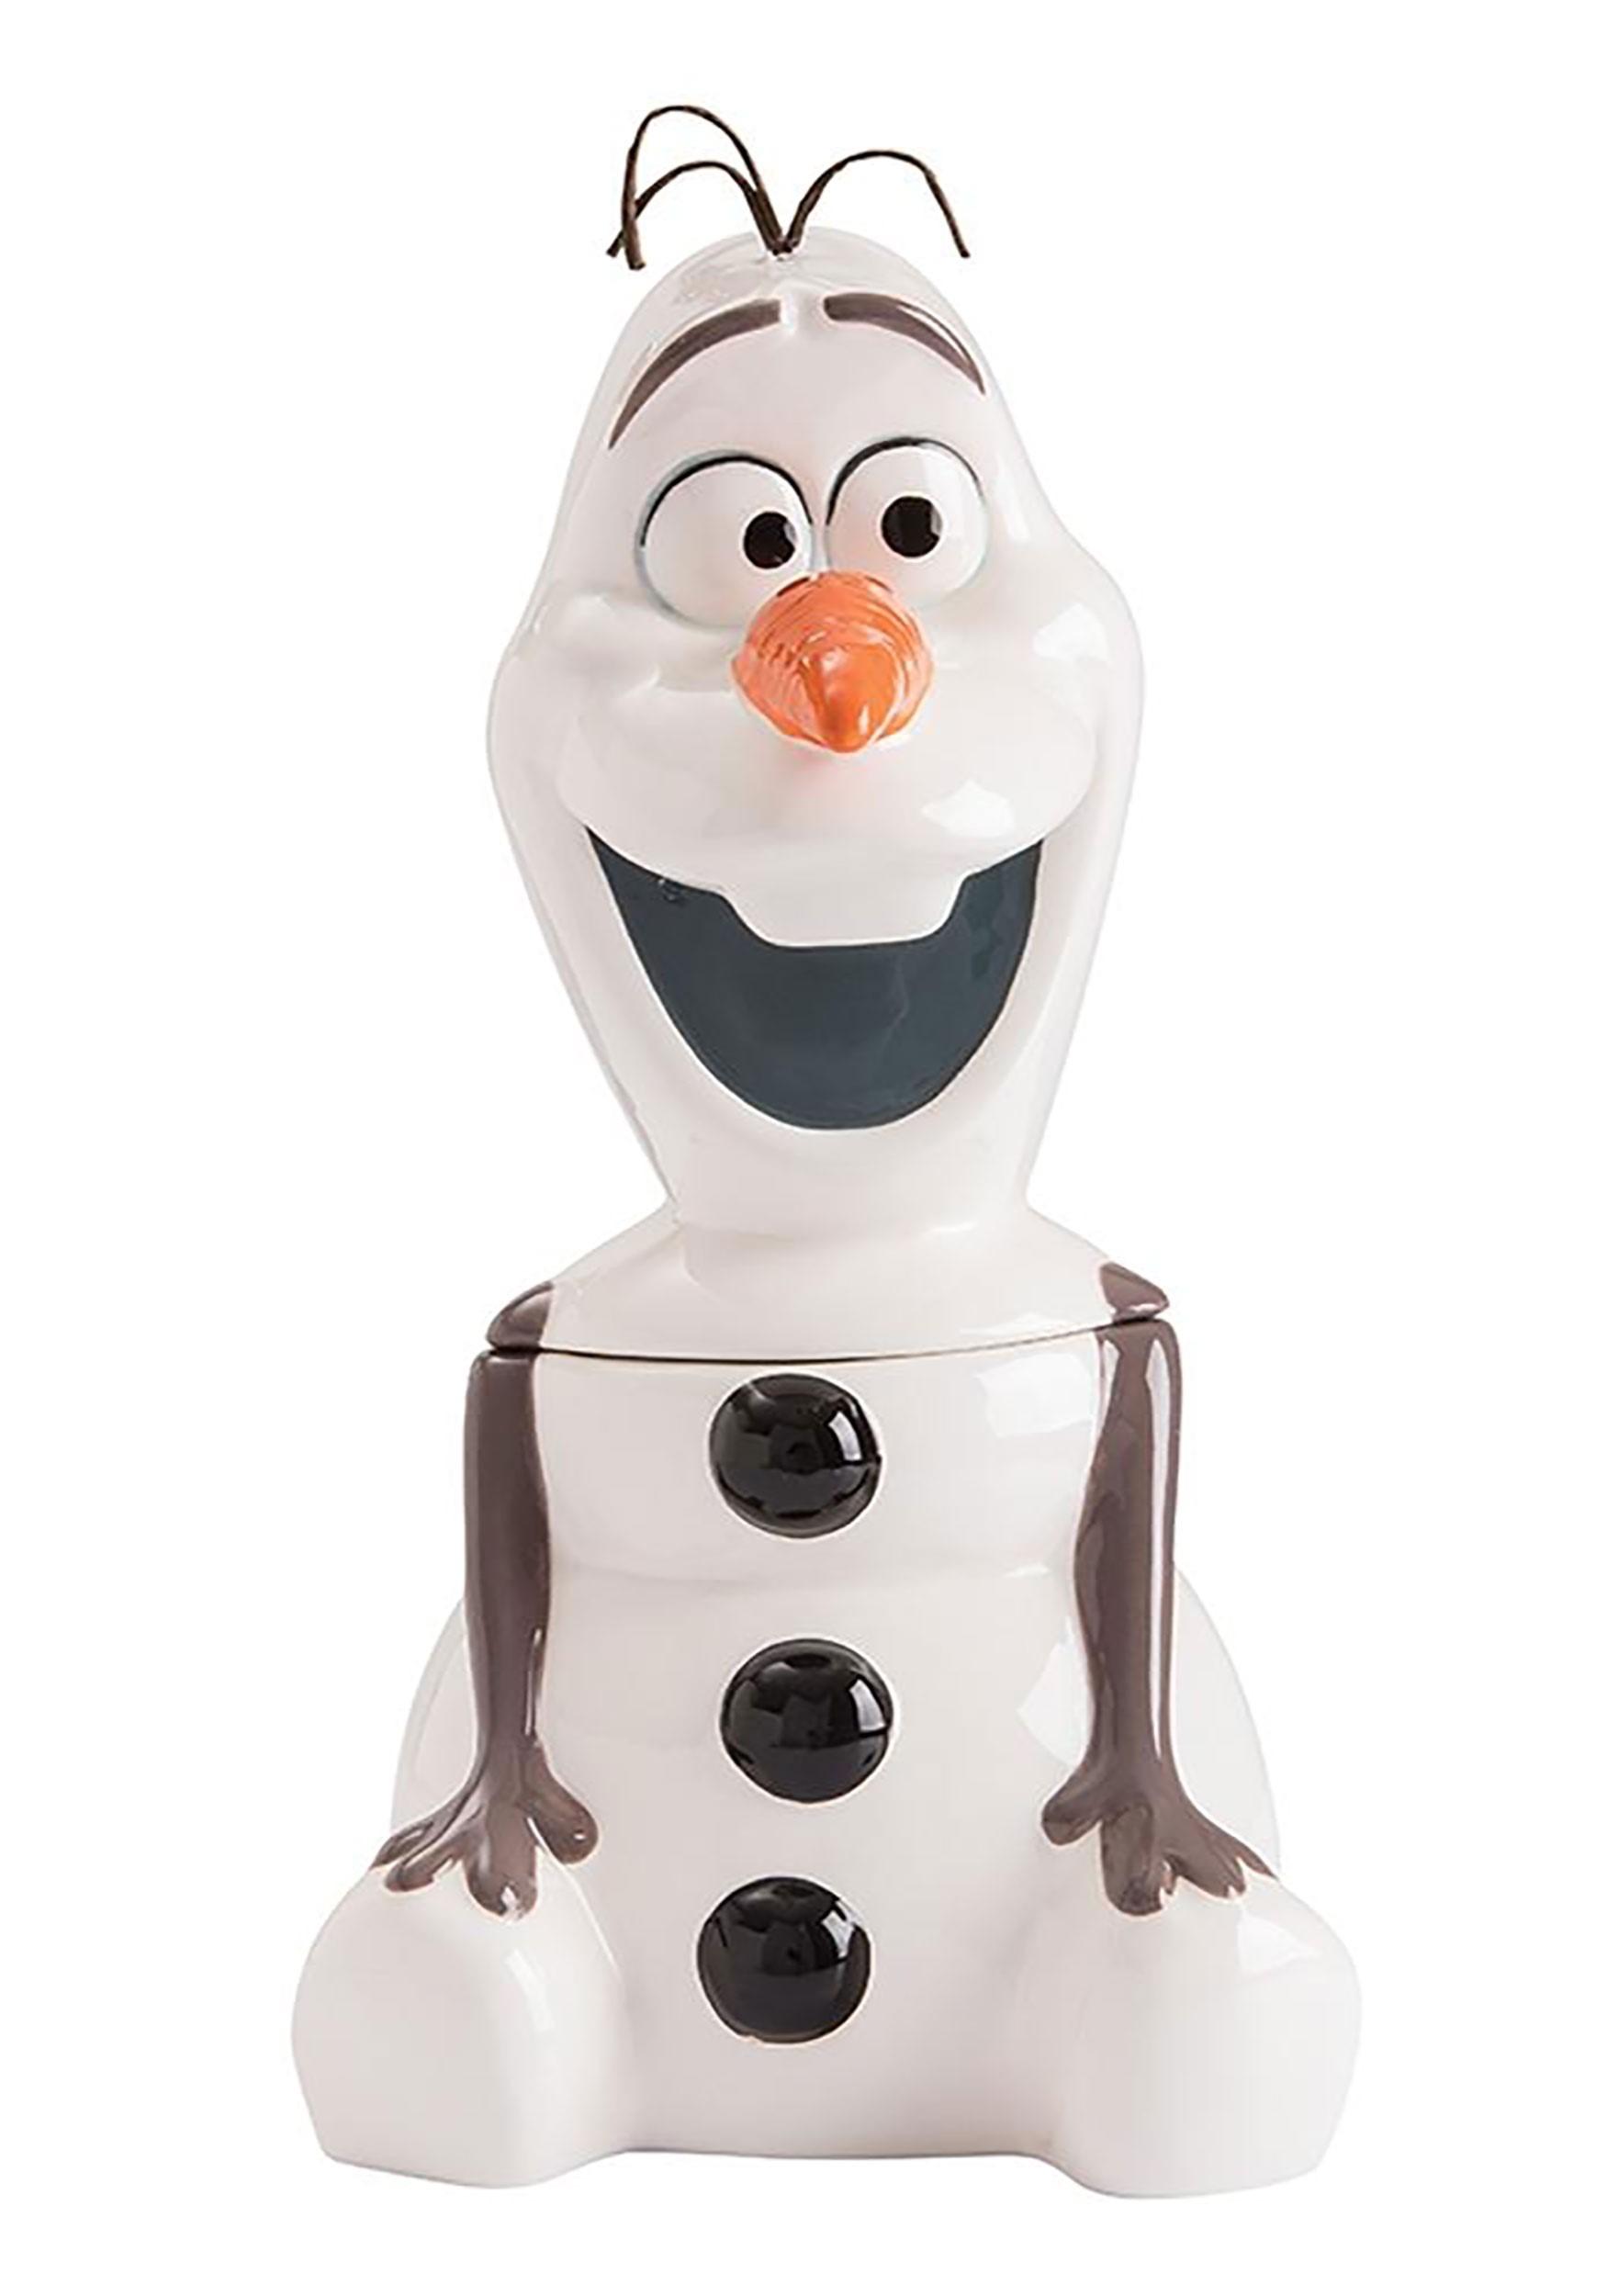 Frozen Olaf Cookie Jar Disney